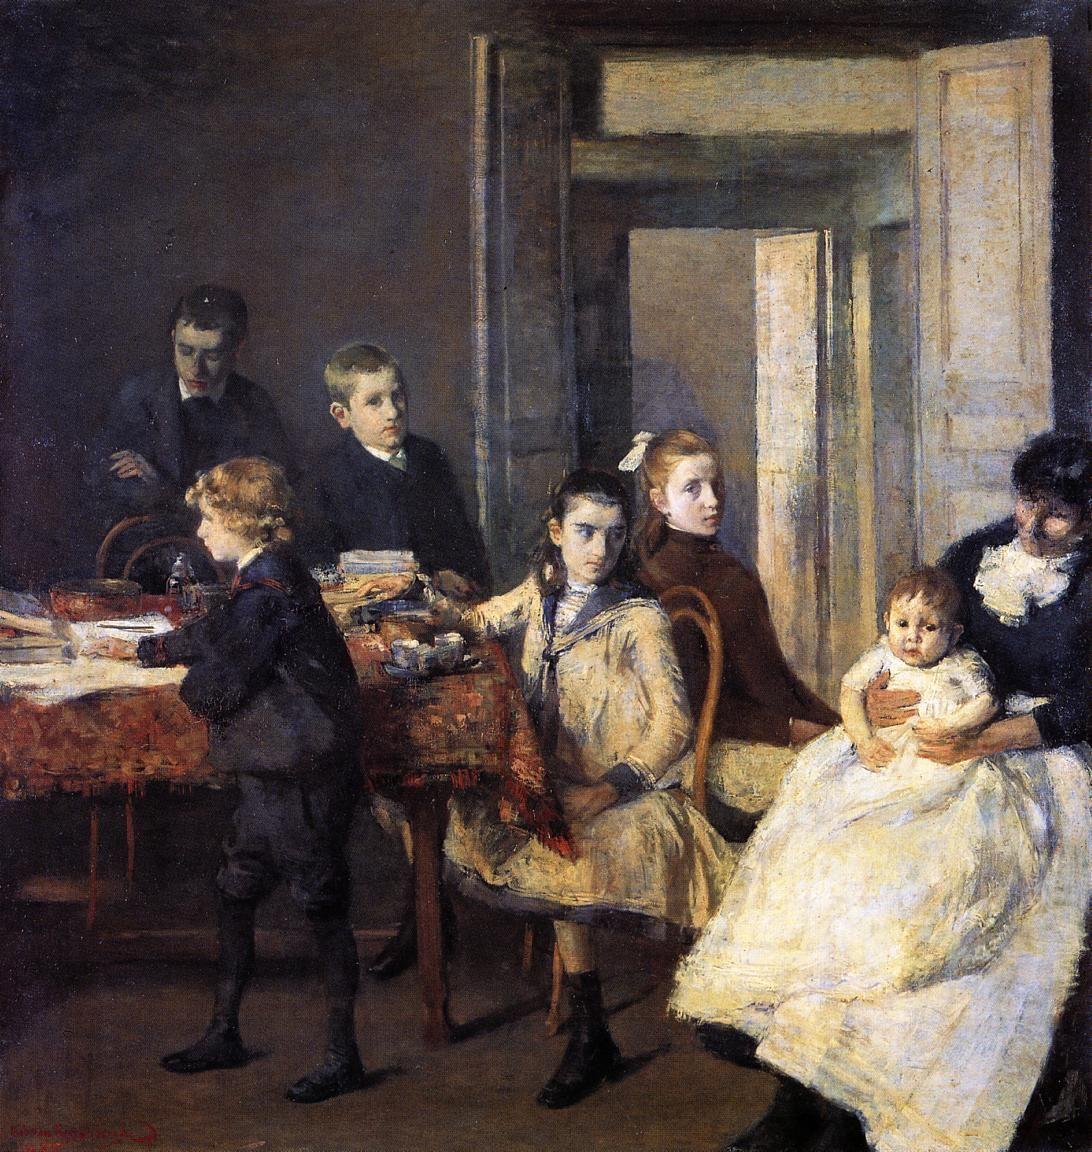 The Children of Francois van Rysselberghe, 1885  Theo van Rysselberghe